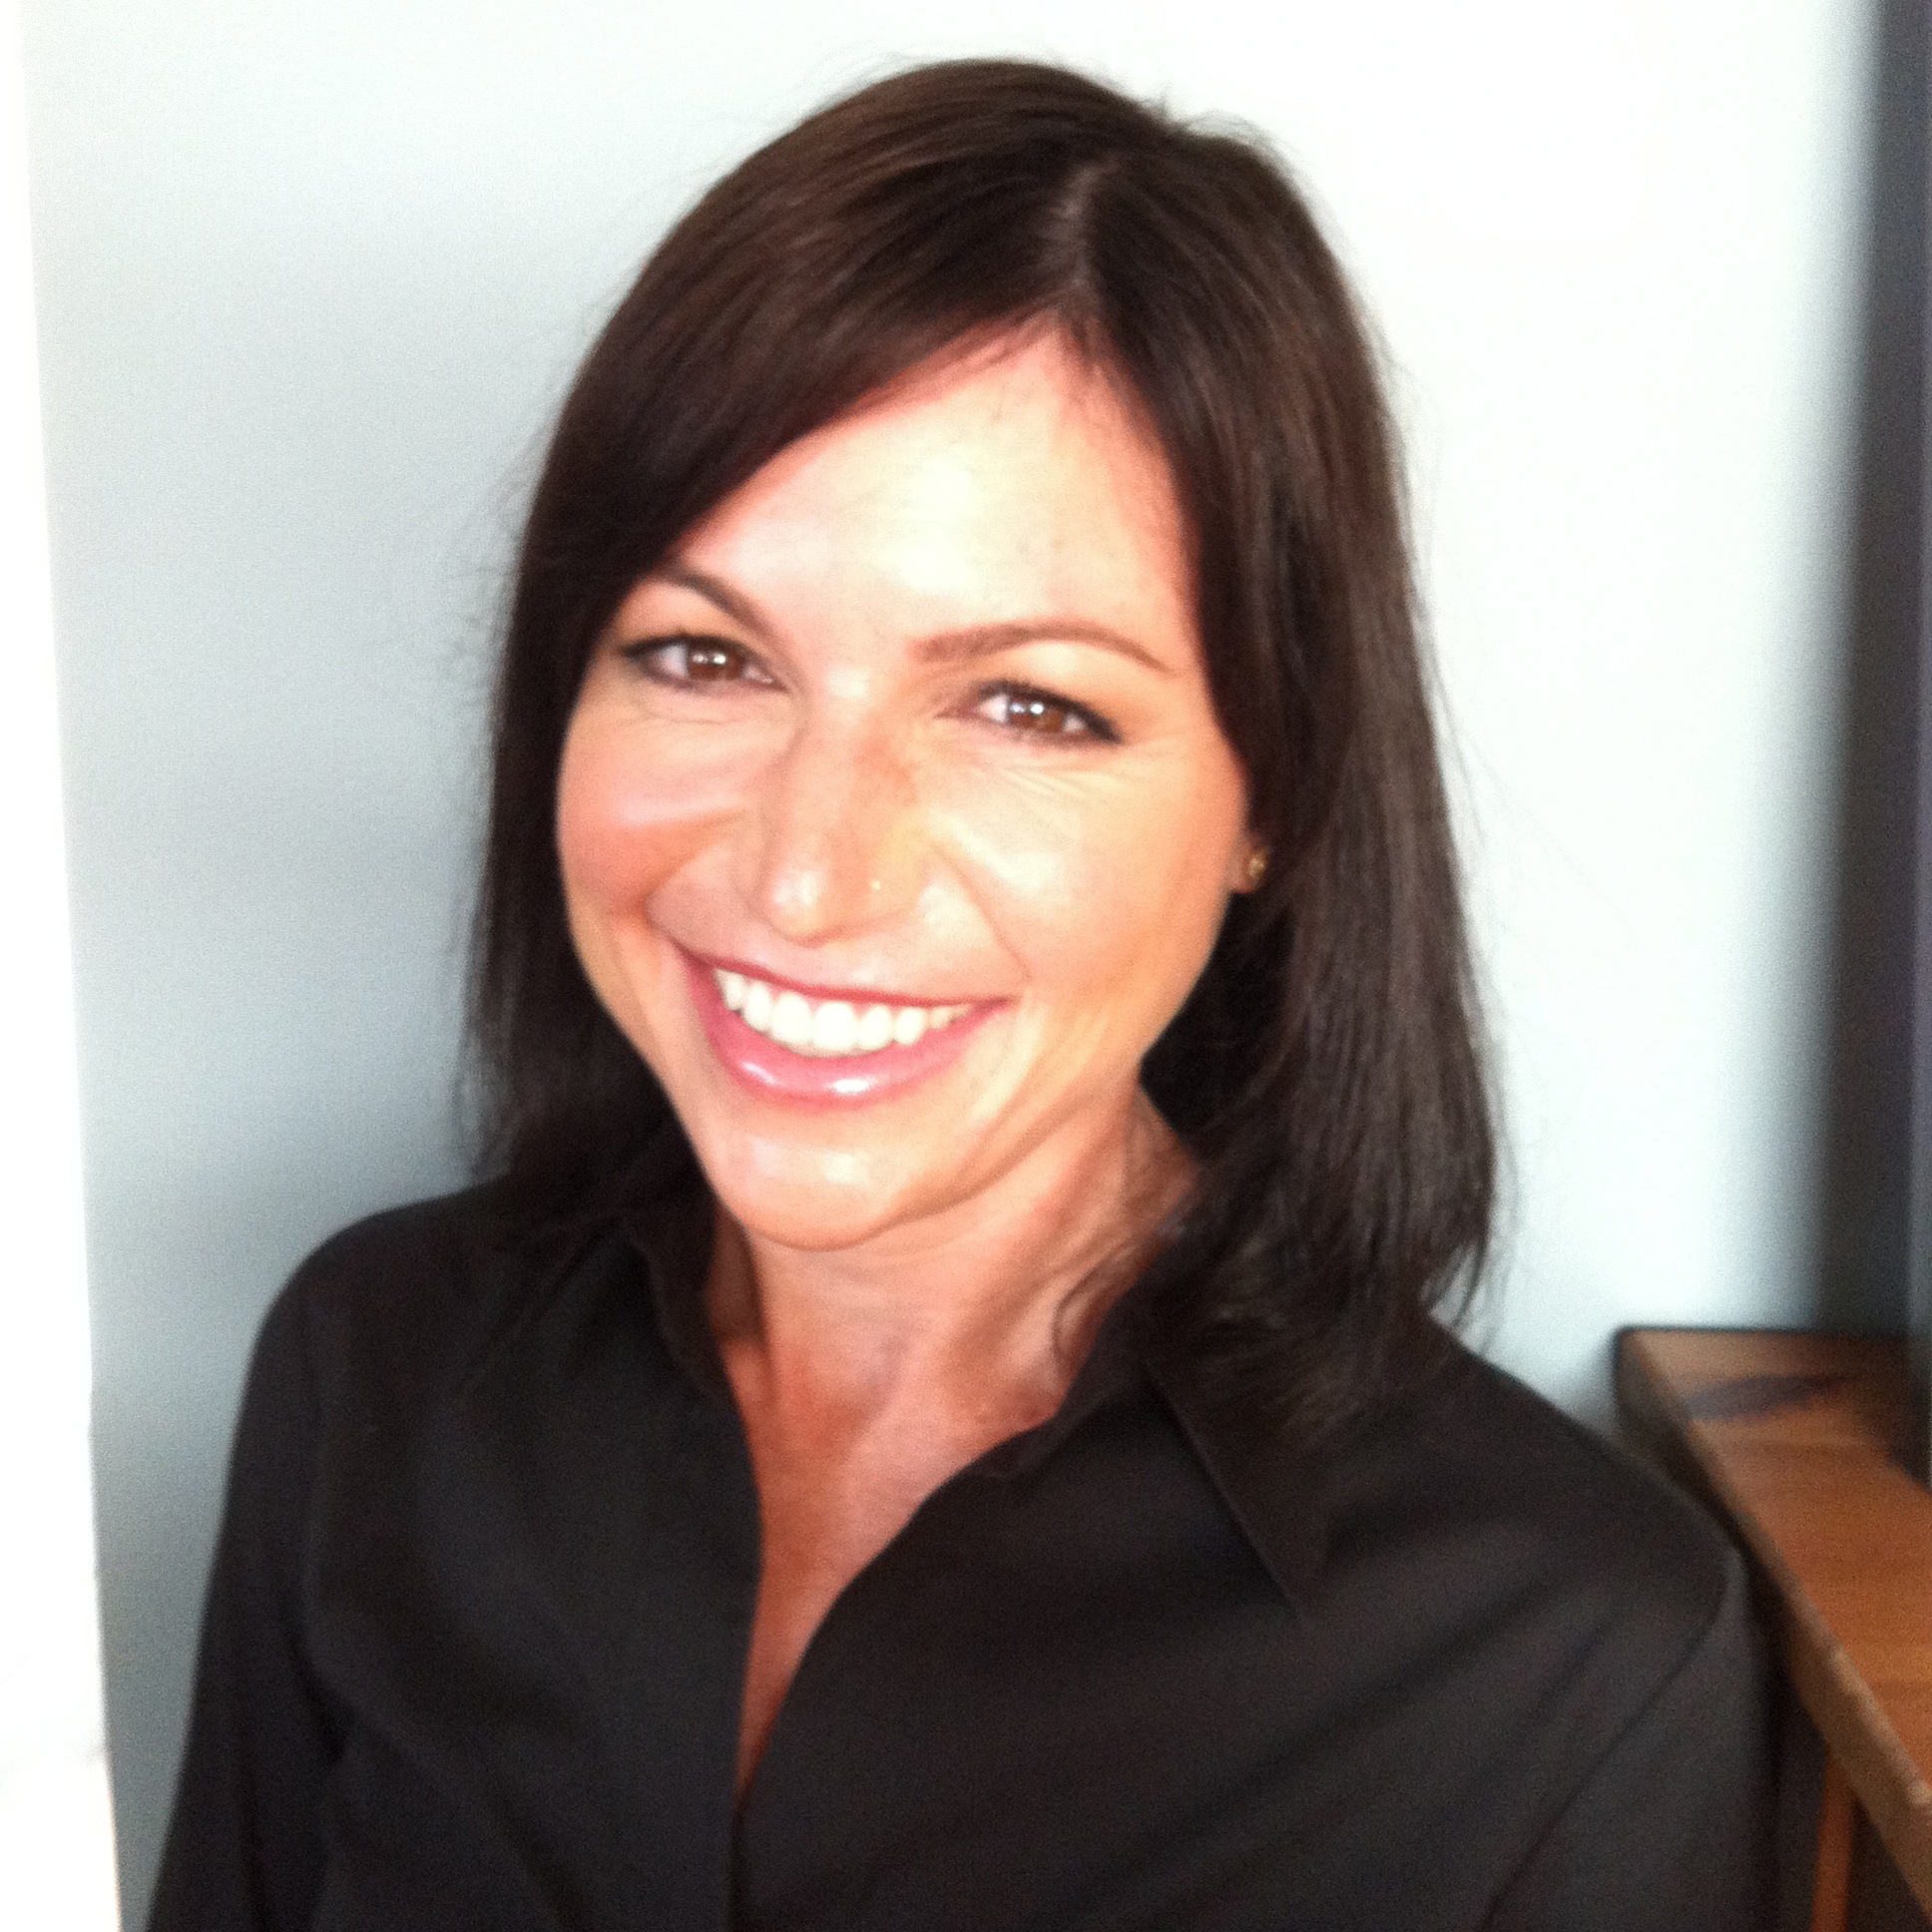 Amy Isackson